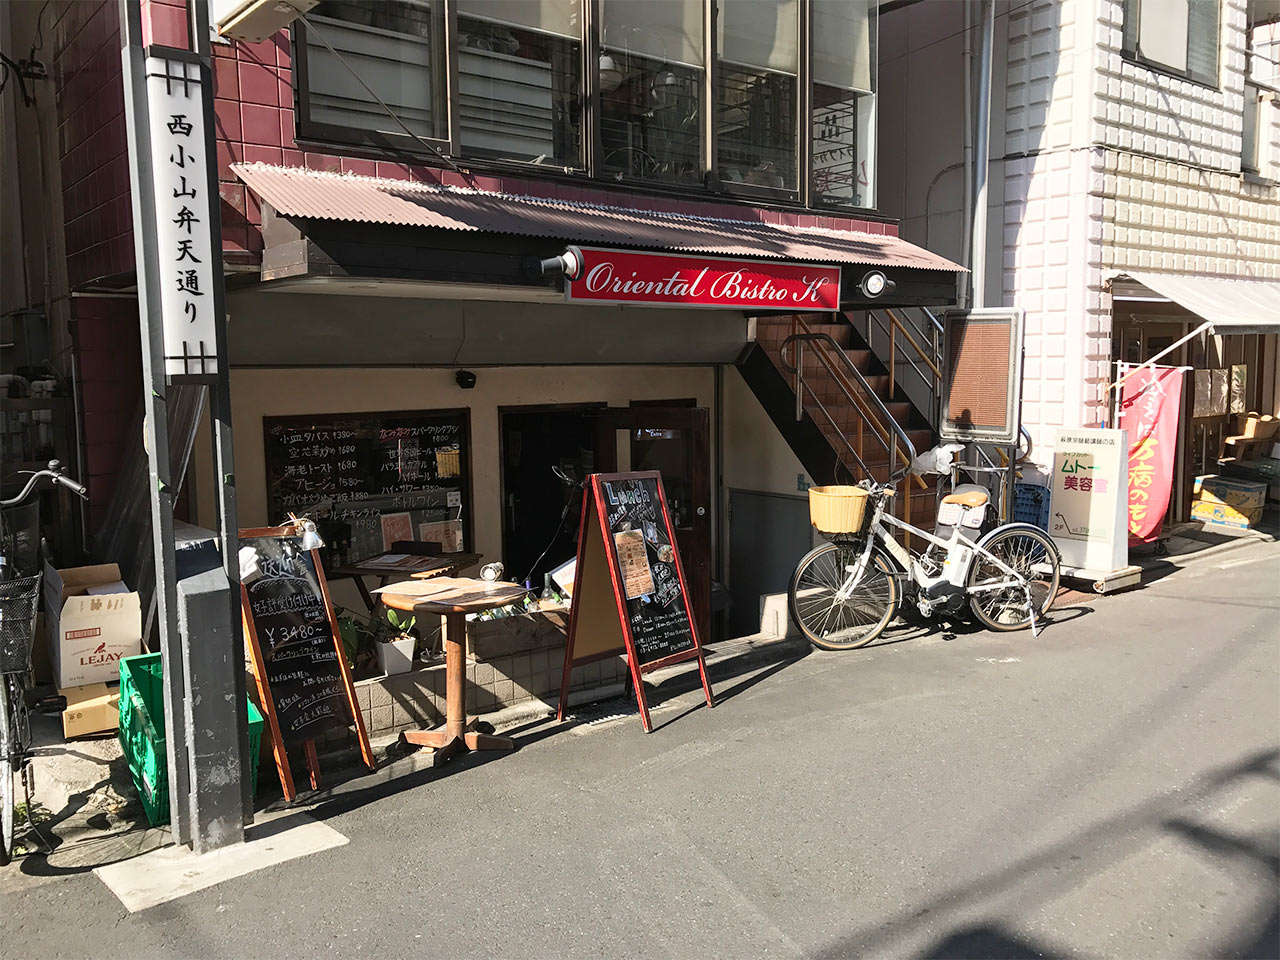 nishikoyama-oriental-bistro-k-gaikan